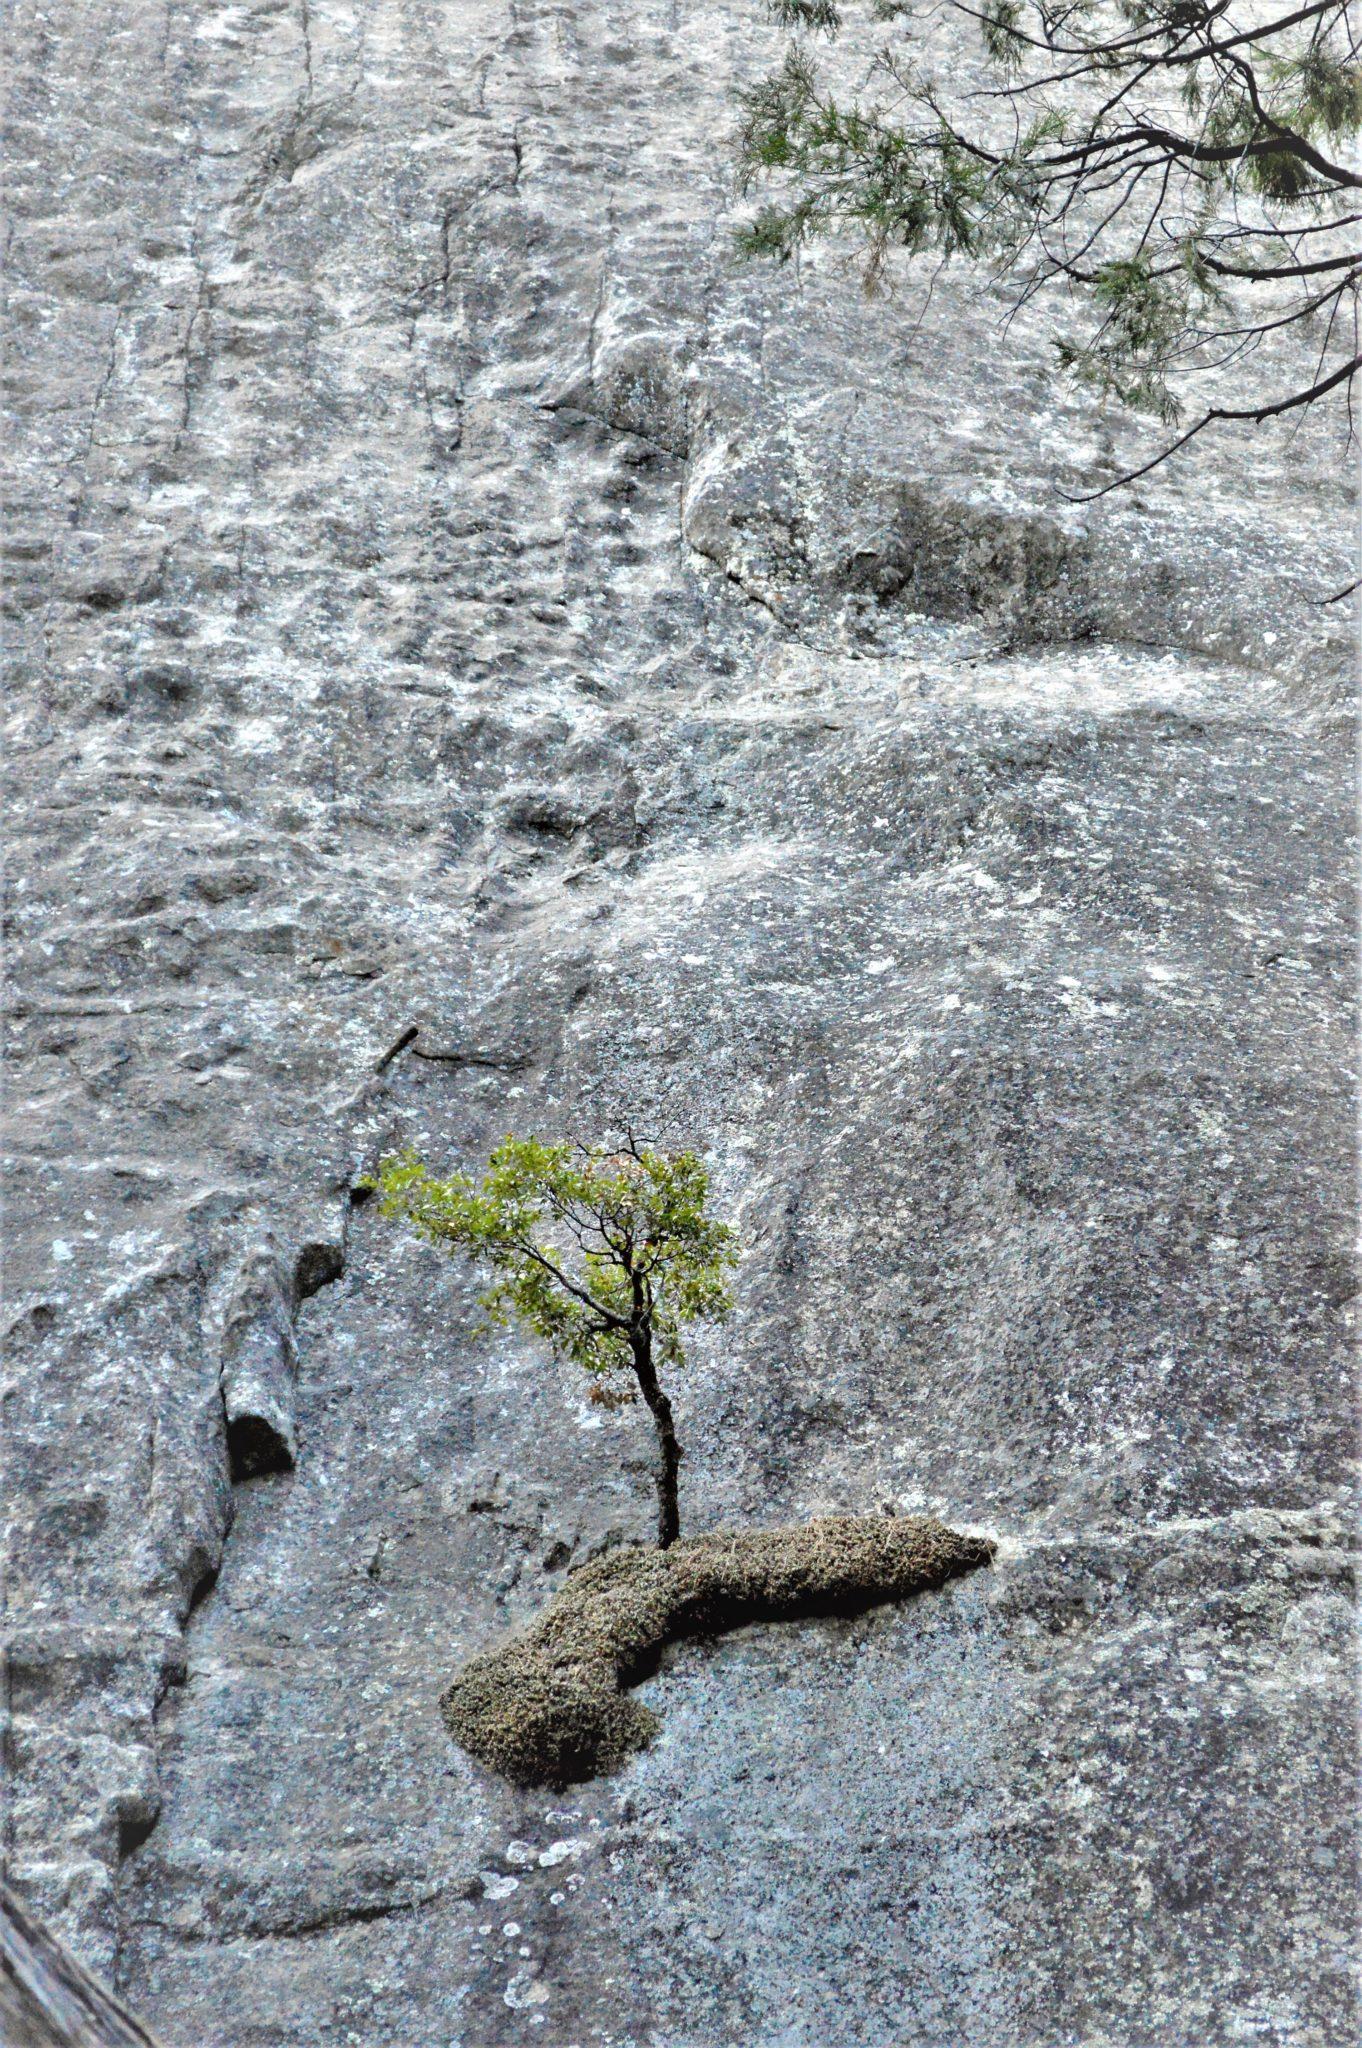 Tree on cliff, Yosemite National Park, California, USA